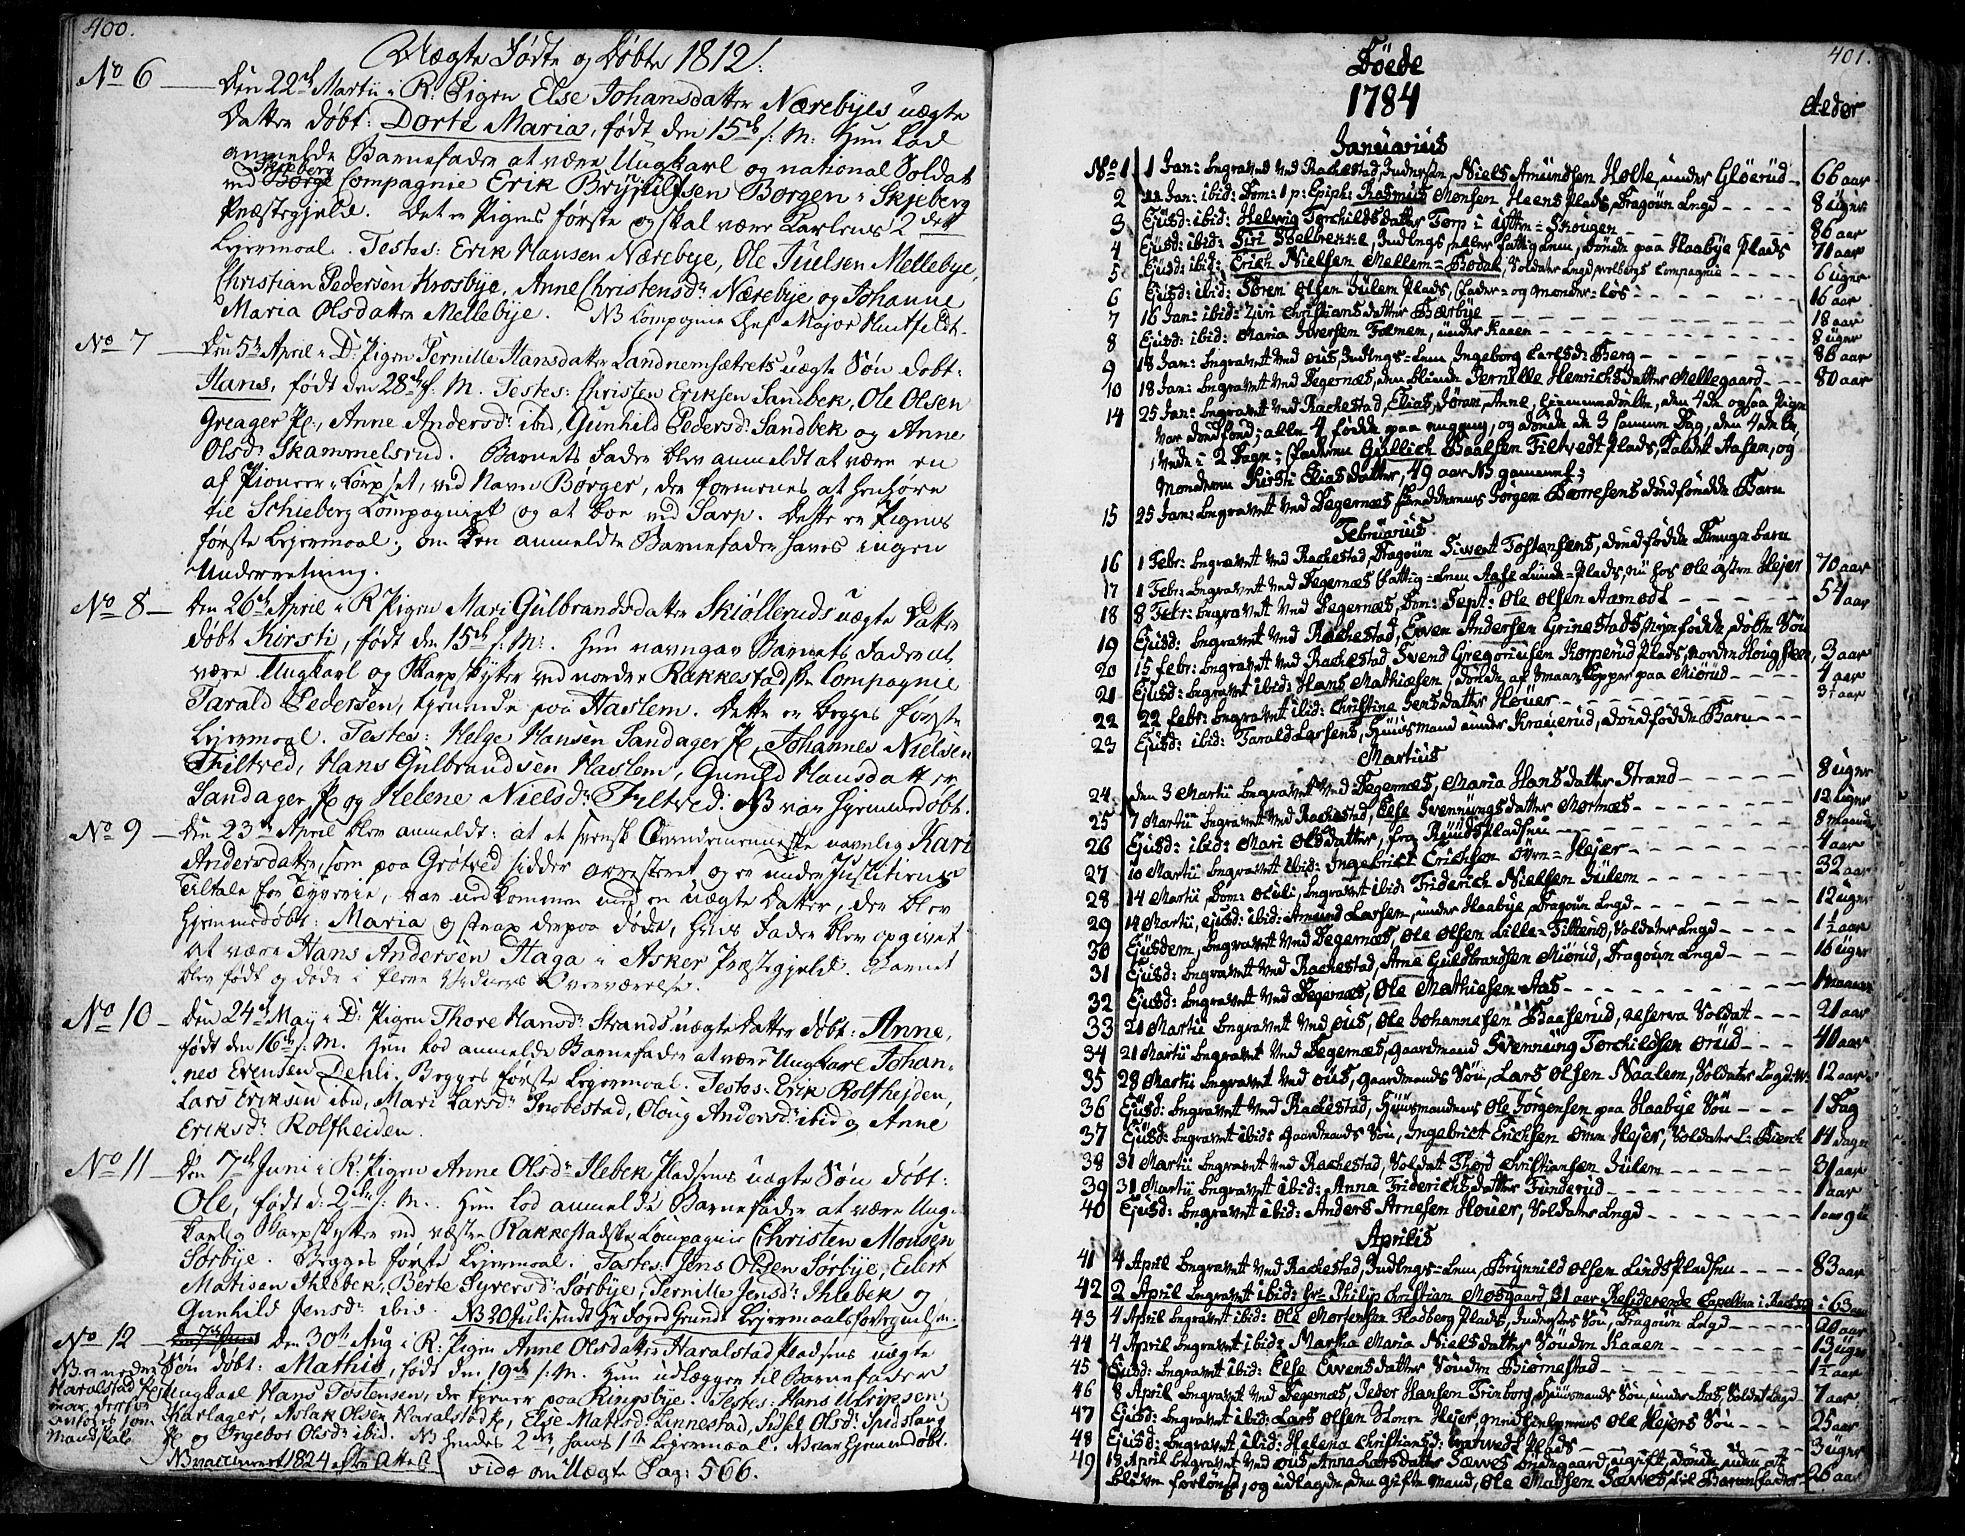 SAO, Rakkestad prestekontor Kirkebøker, F/Fa/L0005: Ministerialbok nr. I 5, 1784-1814, s. 400-401